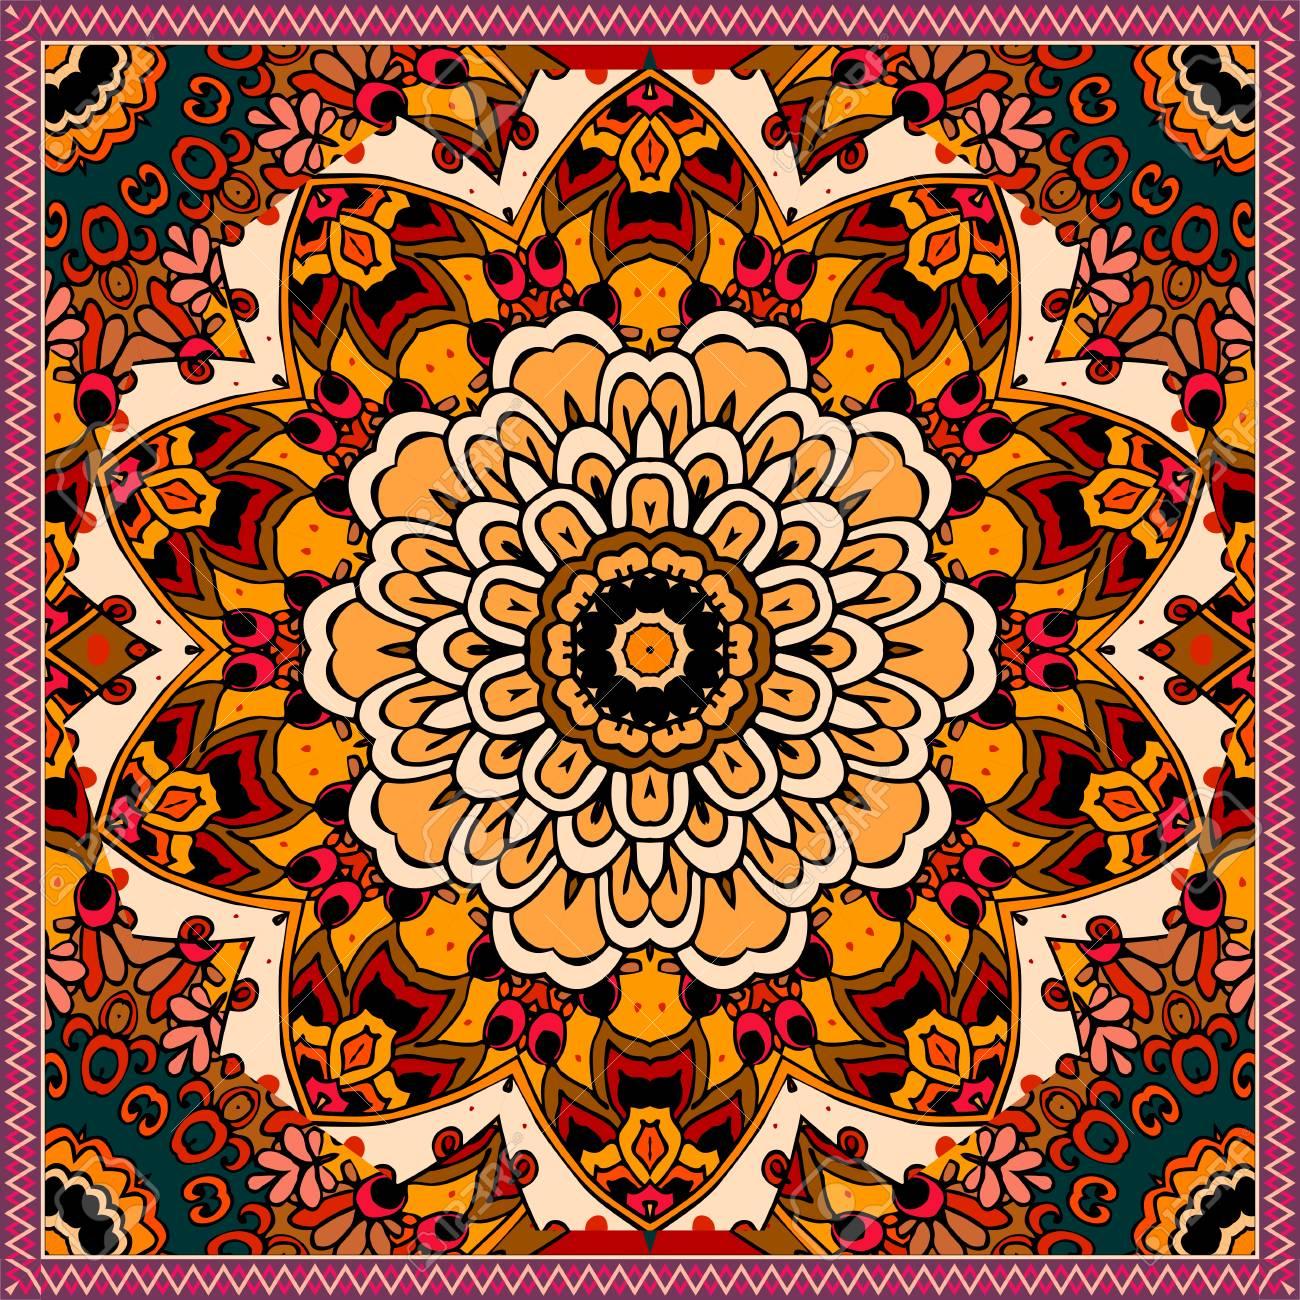 Alfombra étnica Cuadrada Con Mandala De Flores En Tonos Cálidos